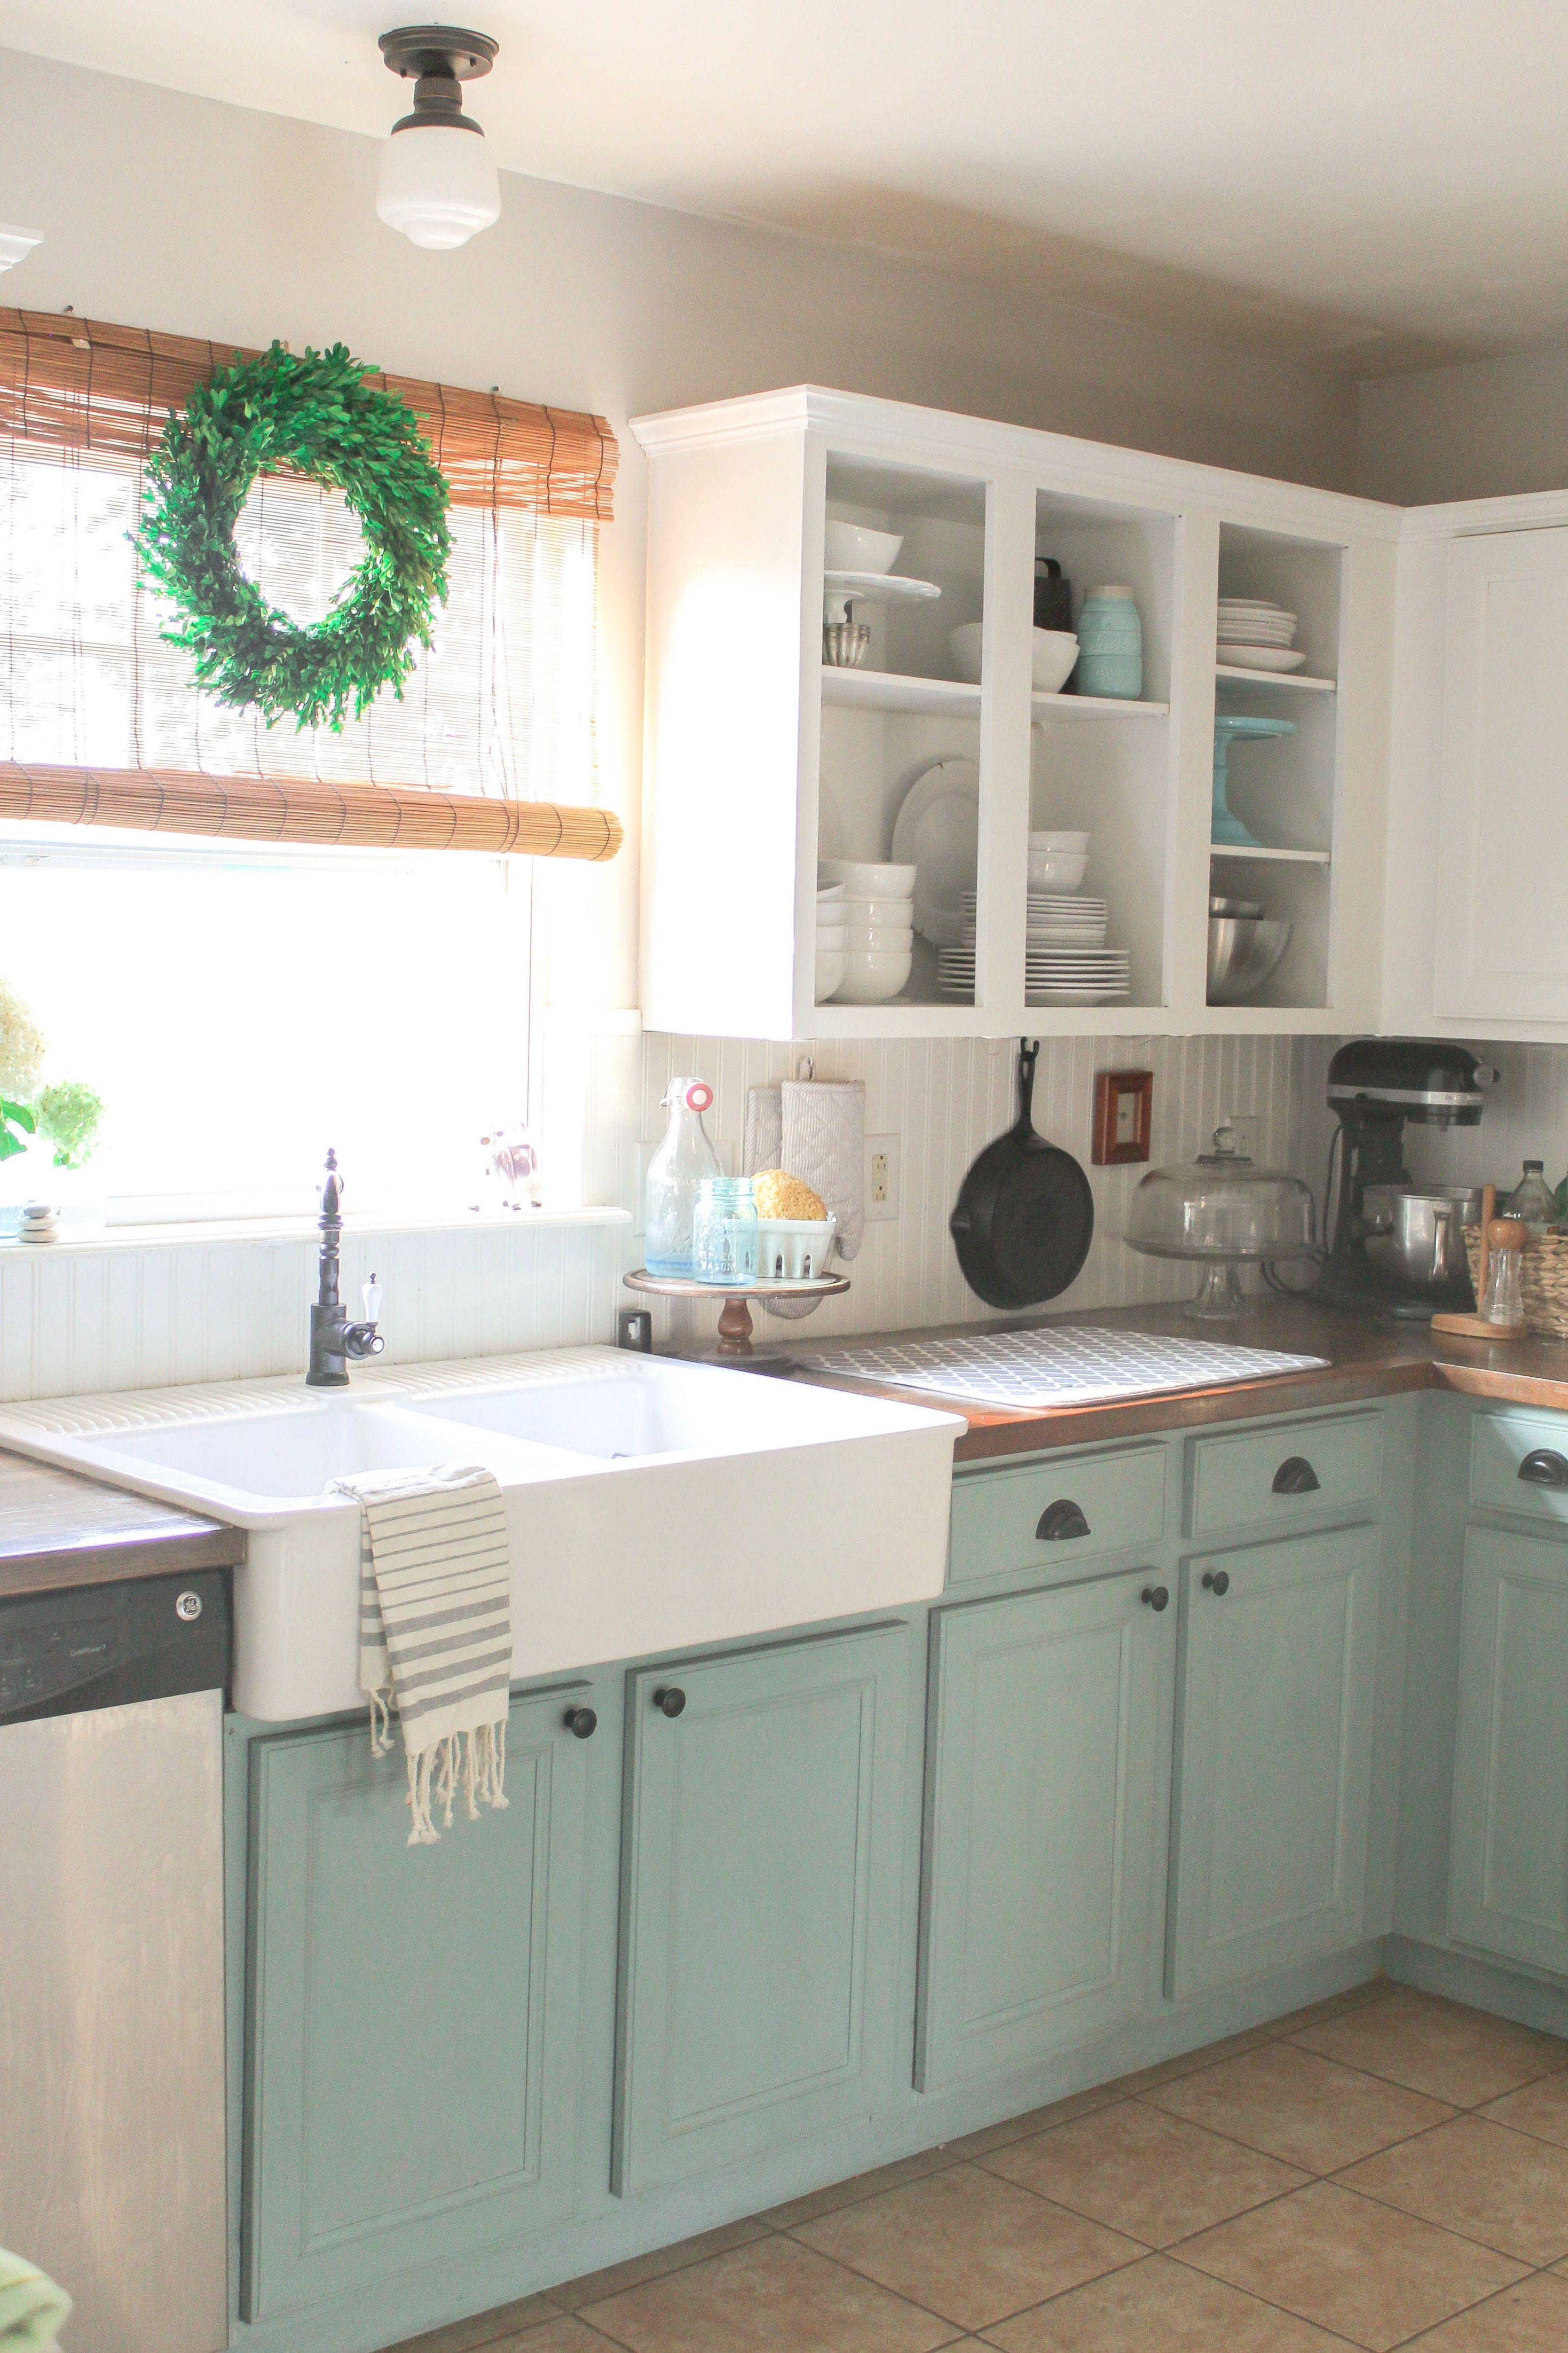 Duck Egg Blue Kitchen Cabinets Https Festivalmontmelas Com P 48987 Kitchen Cabinet Chalk Paint Kitchen Cabinets Painting Kitchen Cabinets Home Kitchens